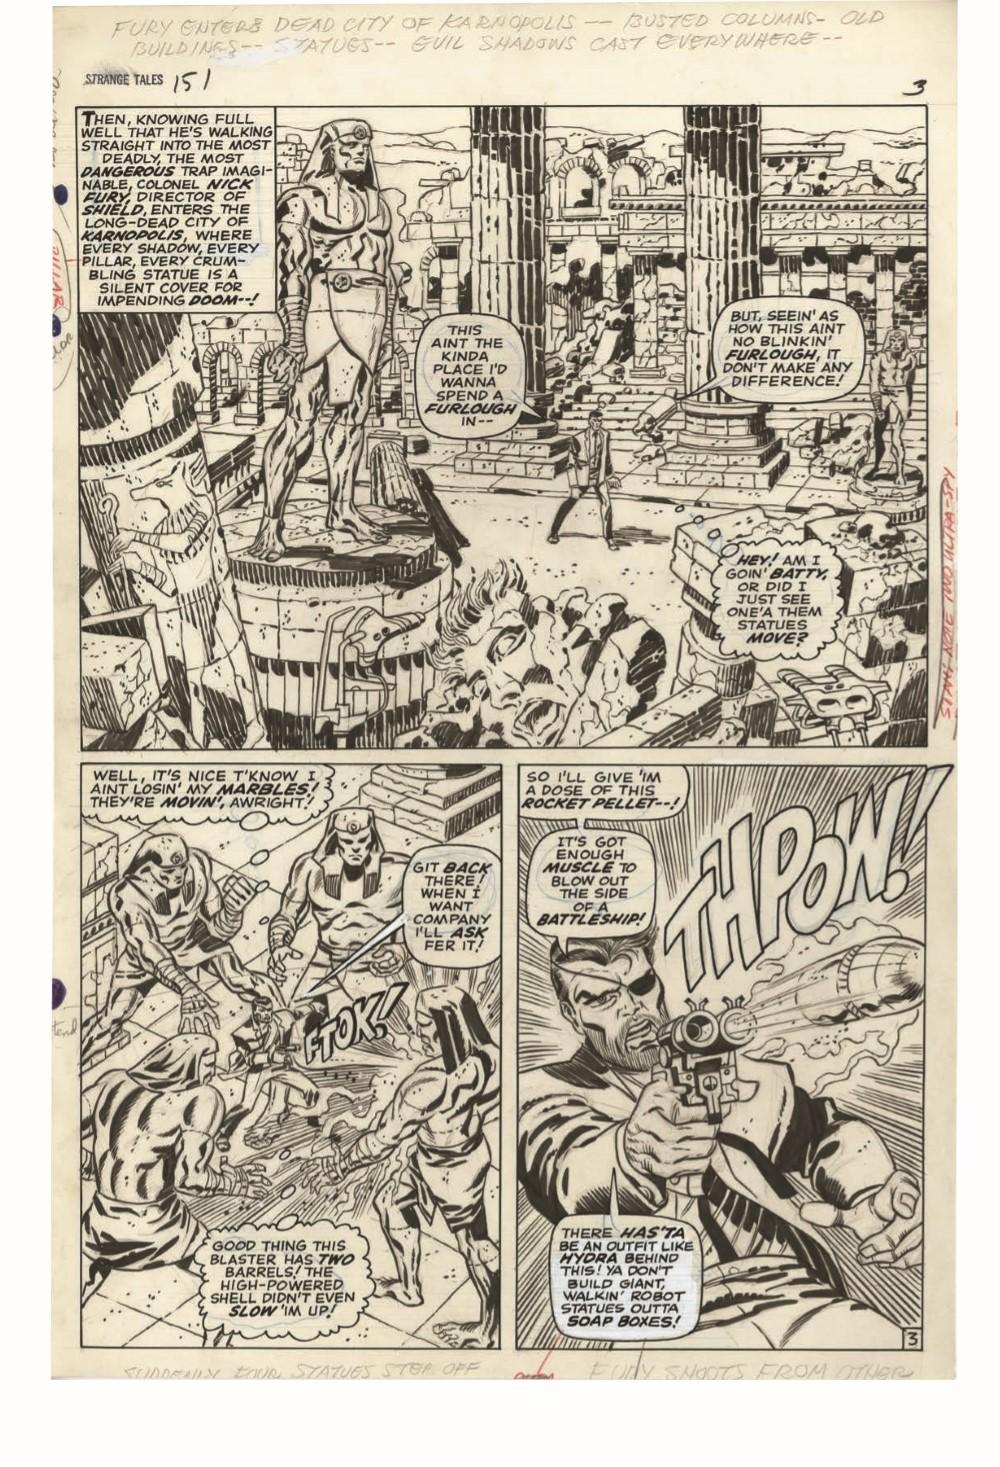 STERANKO_artisan_edition_pr-6 ComicList Previews: JIM STERANKO'S NICK FURY AGENT OF S.H.I.E.L.D. ARTISAN EDITION TP